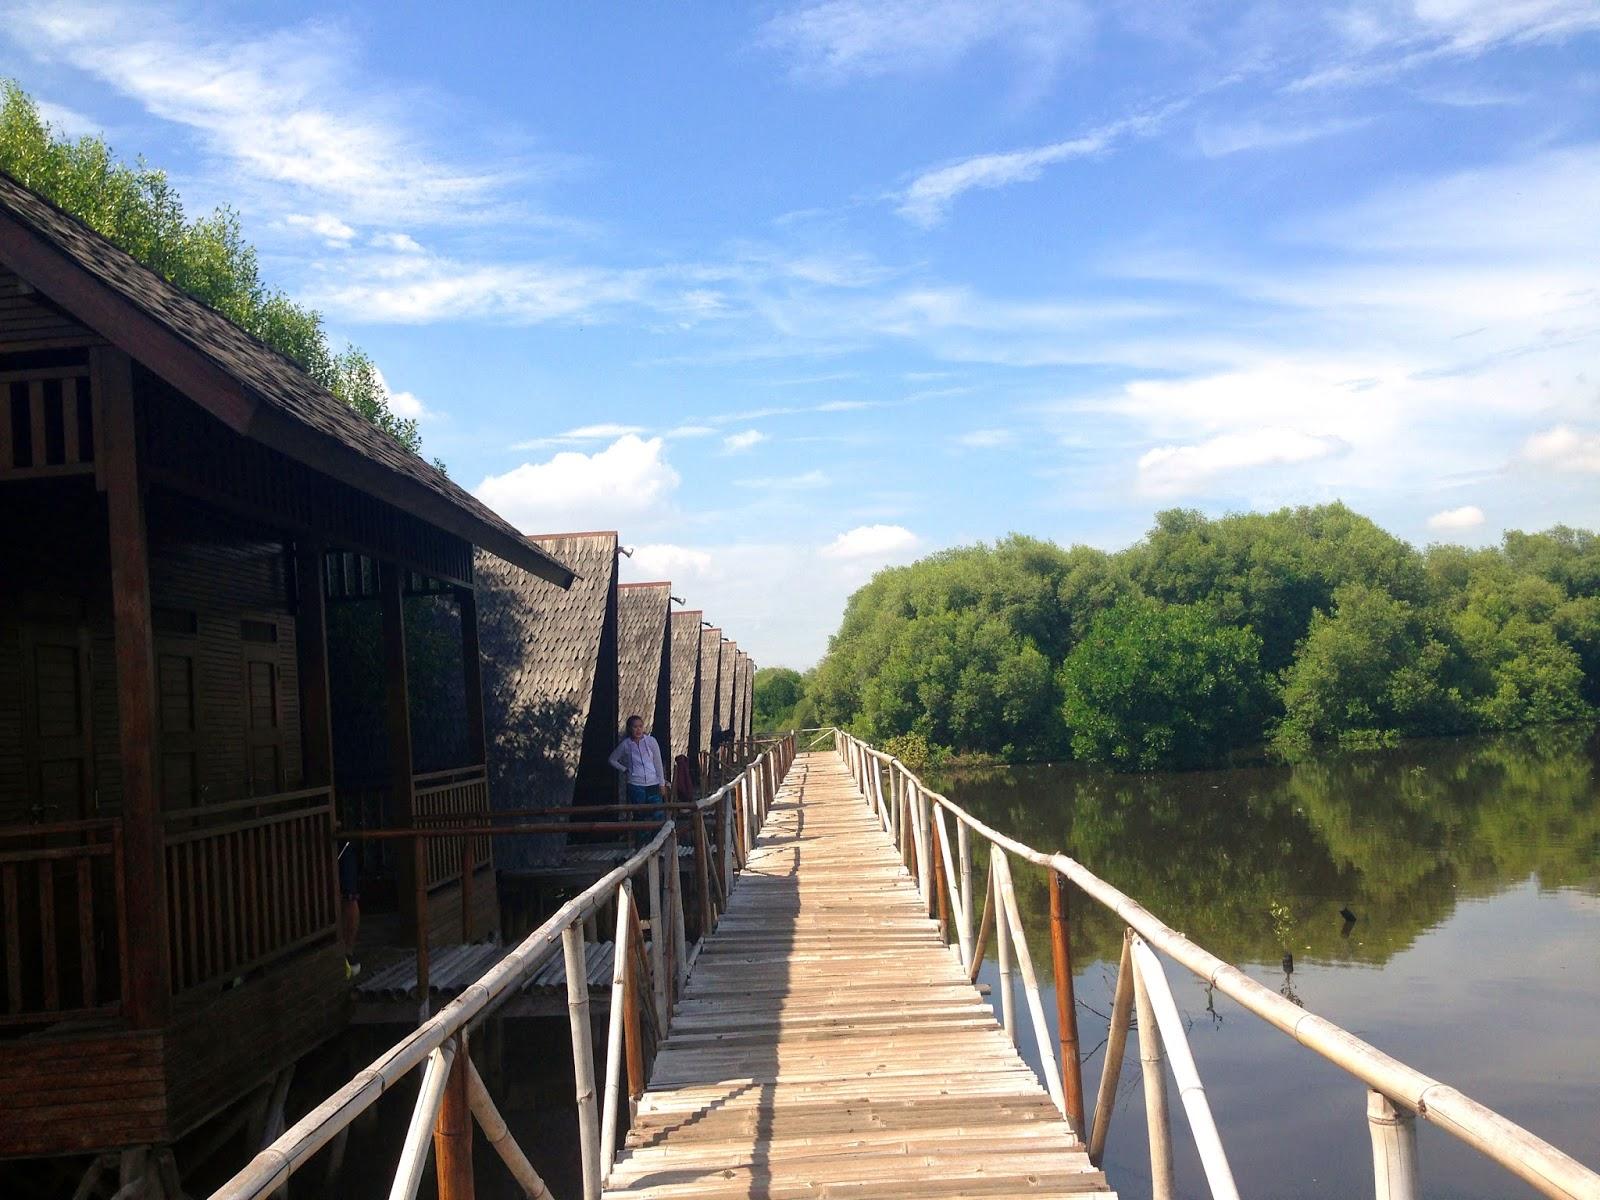 Alternatif liburan jakarta : Taman wisata alam angke Pantai indah kapuk PIK  Look At Me